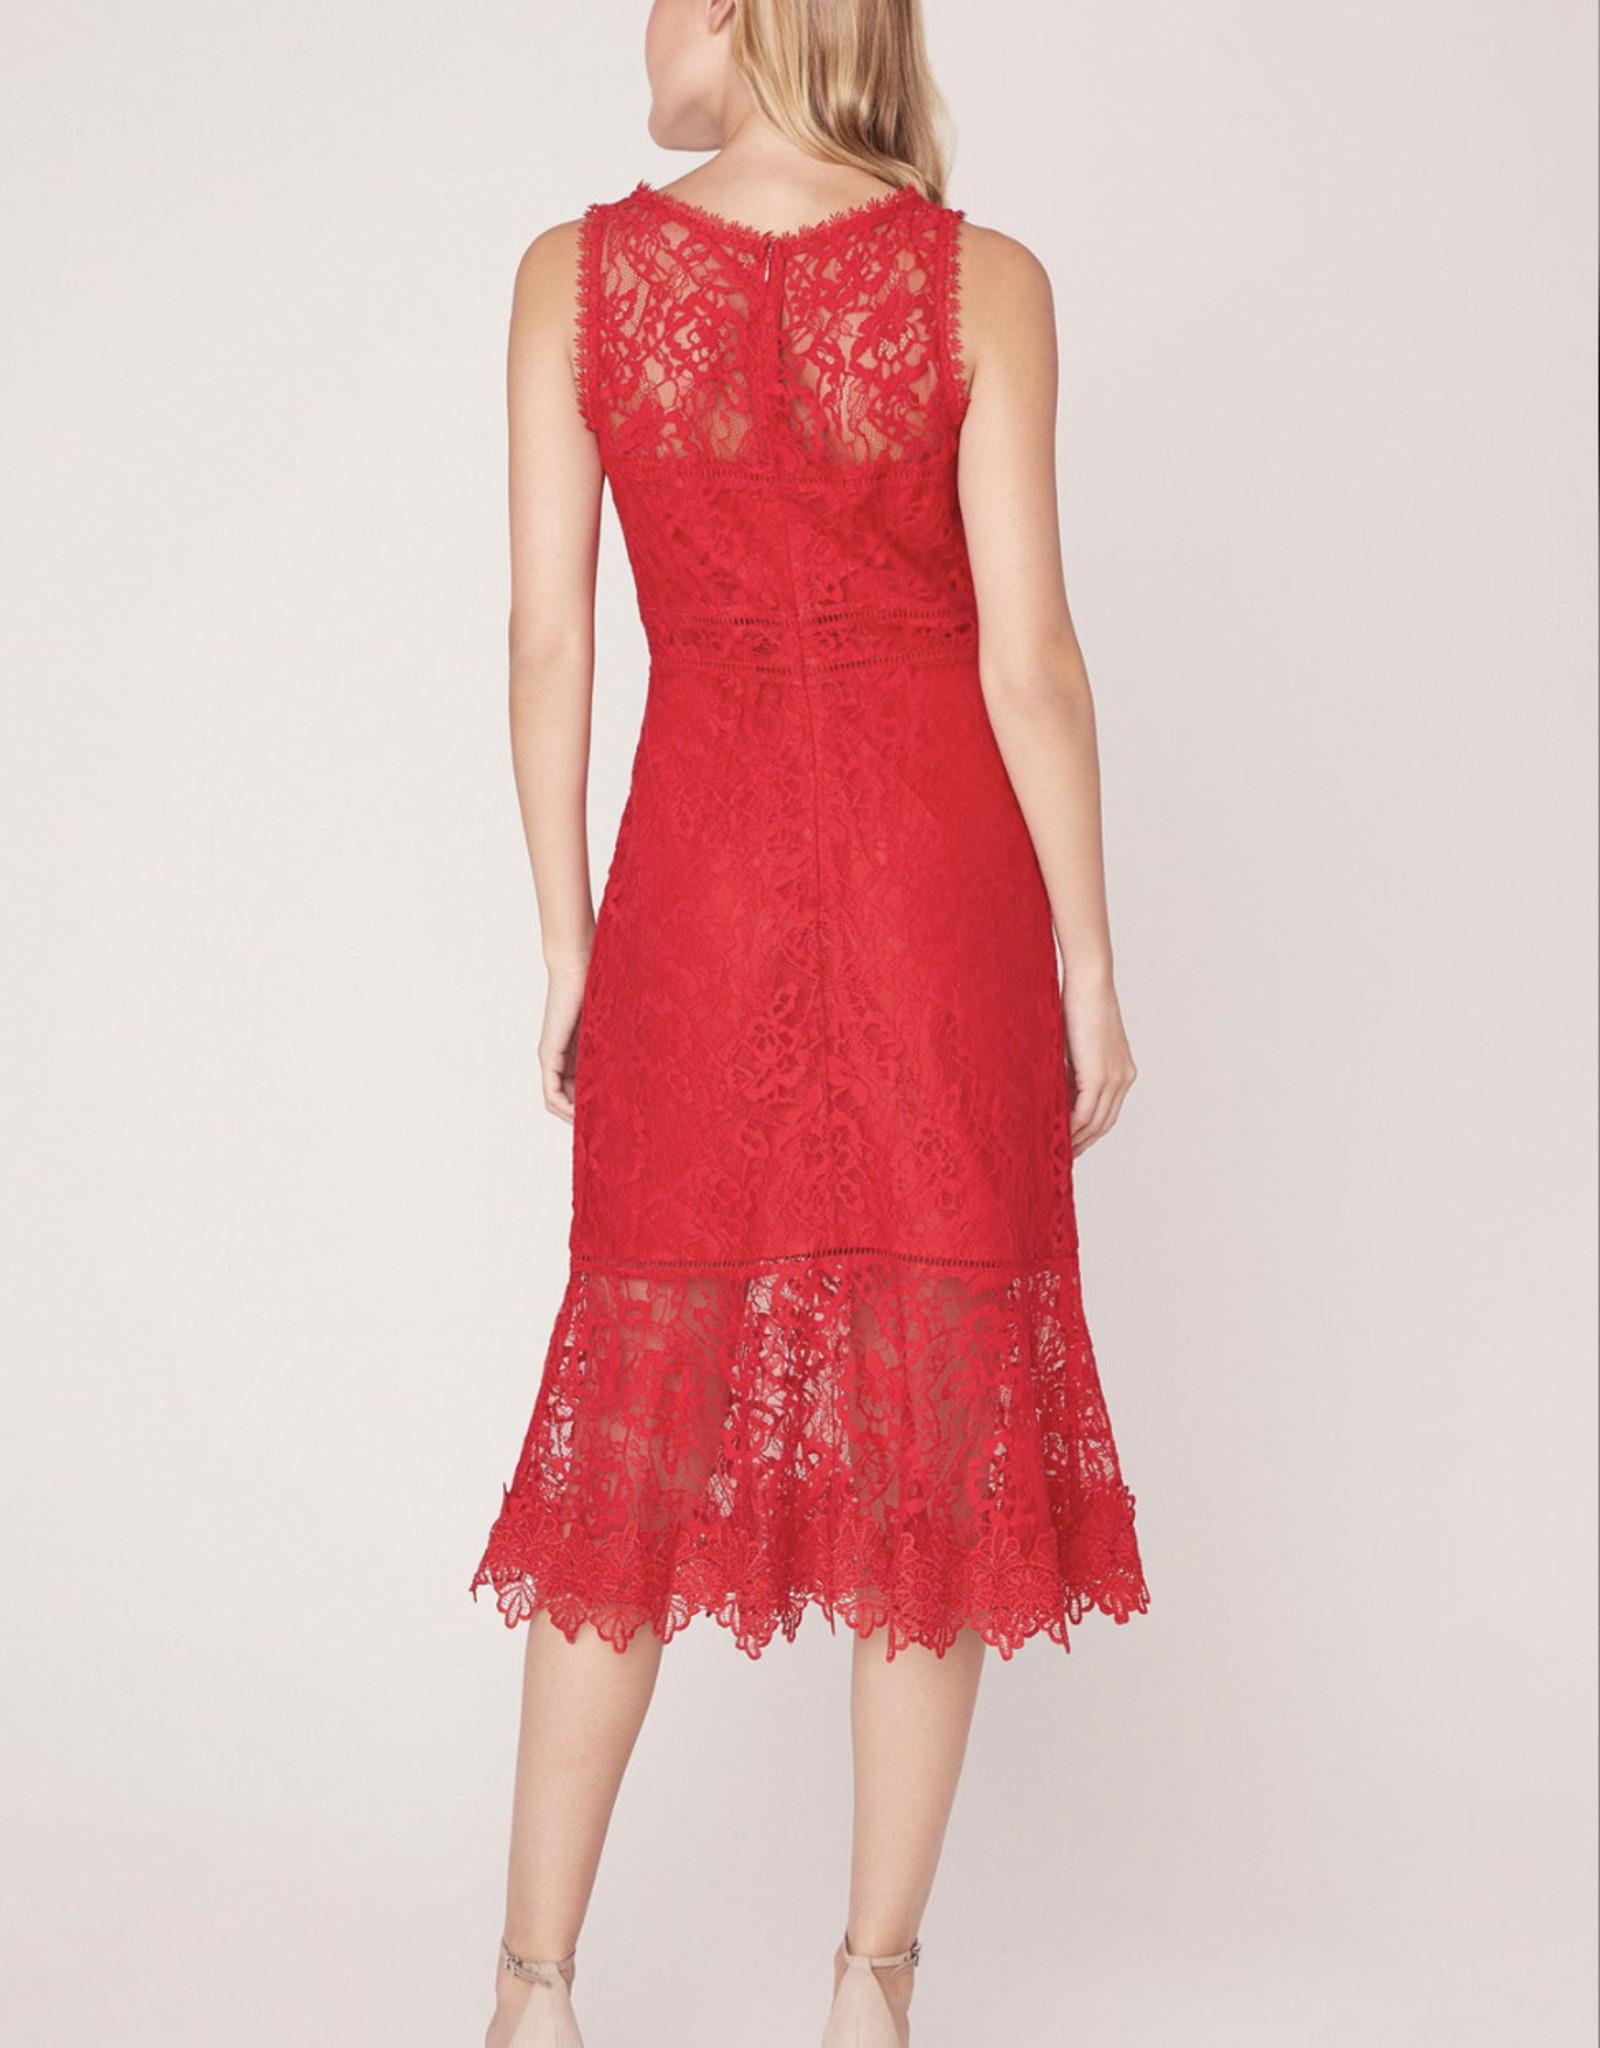 BB DAKOTA Hearing Sirens Dress, Red lace